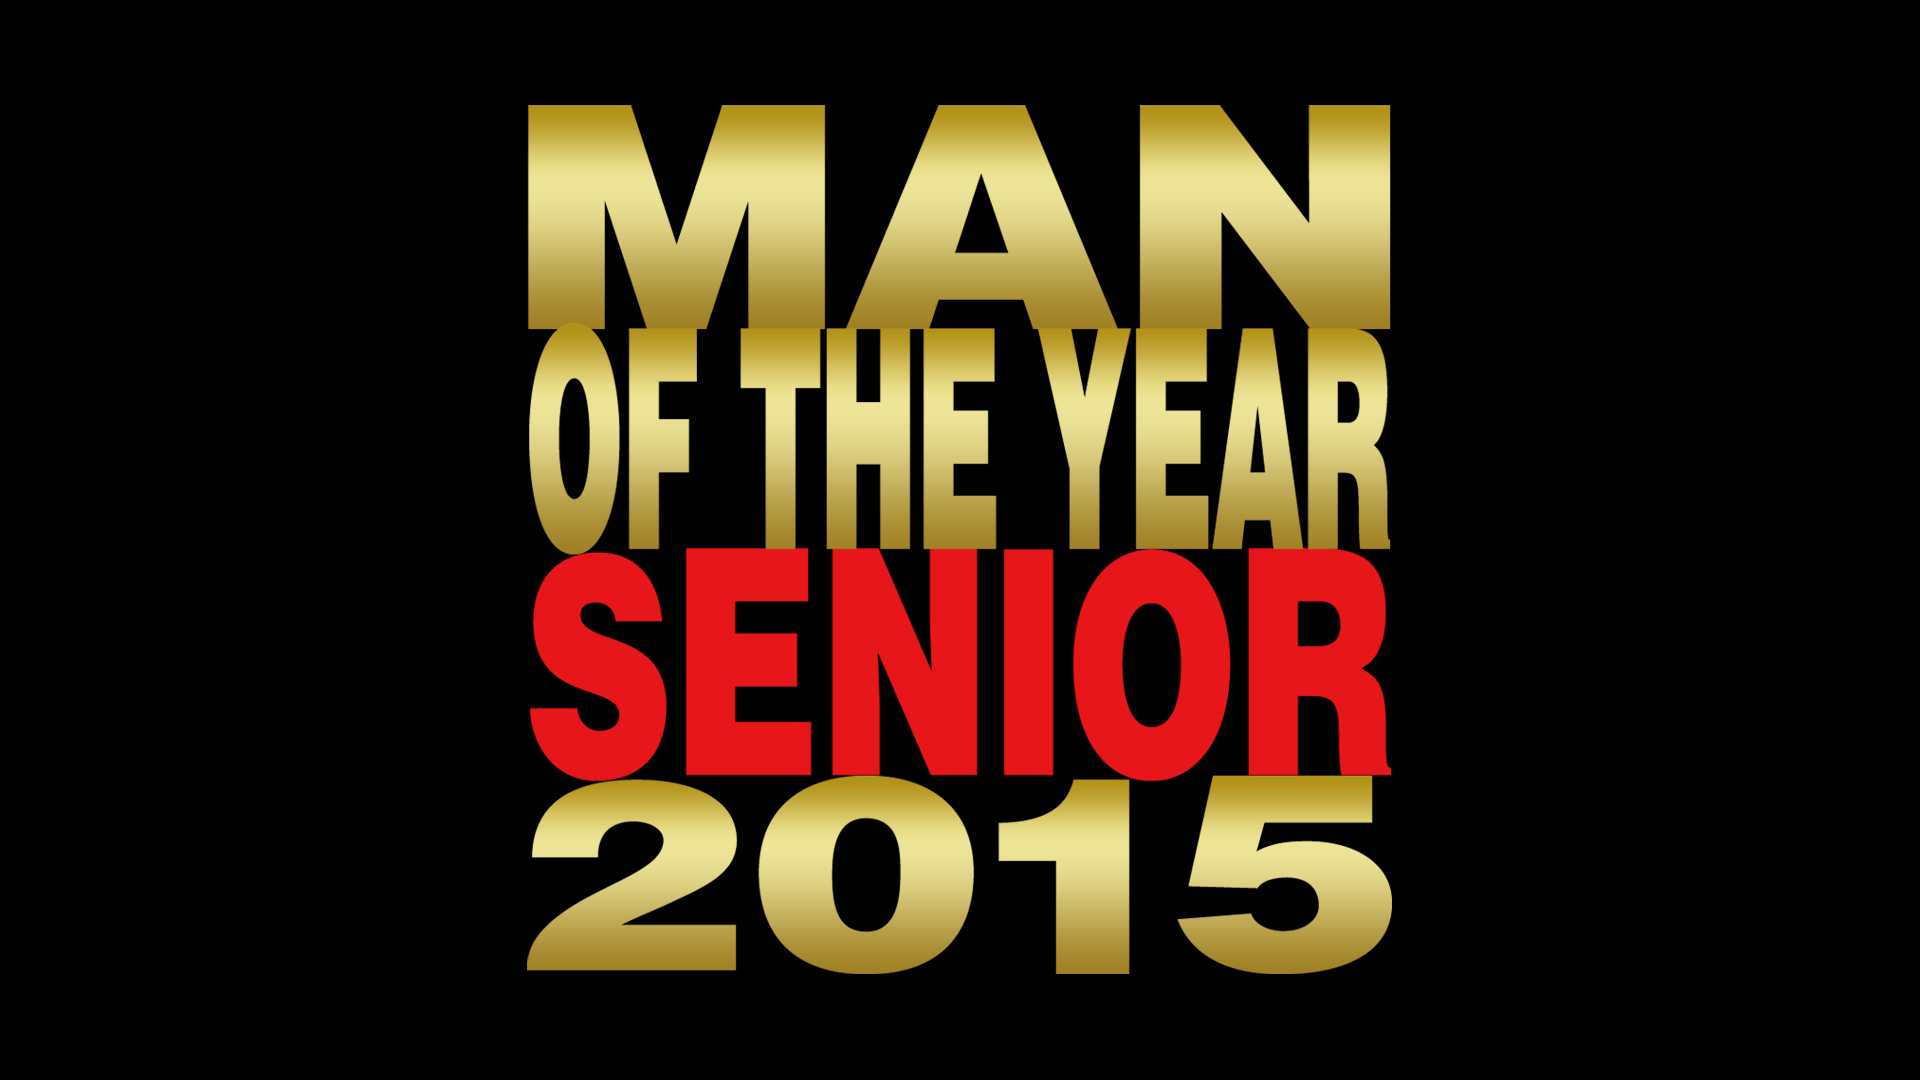 『Man of the Year Senior 2015』 公式サイトがオープンいたしました